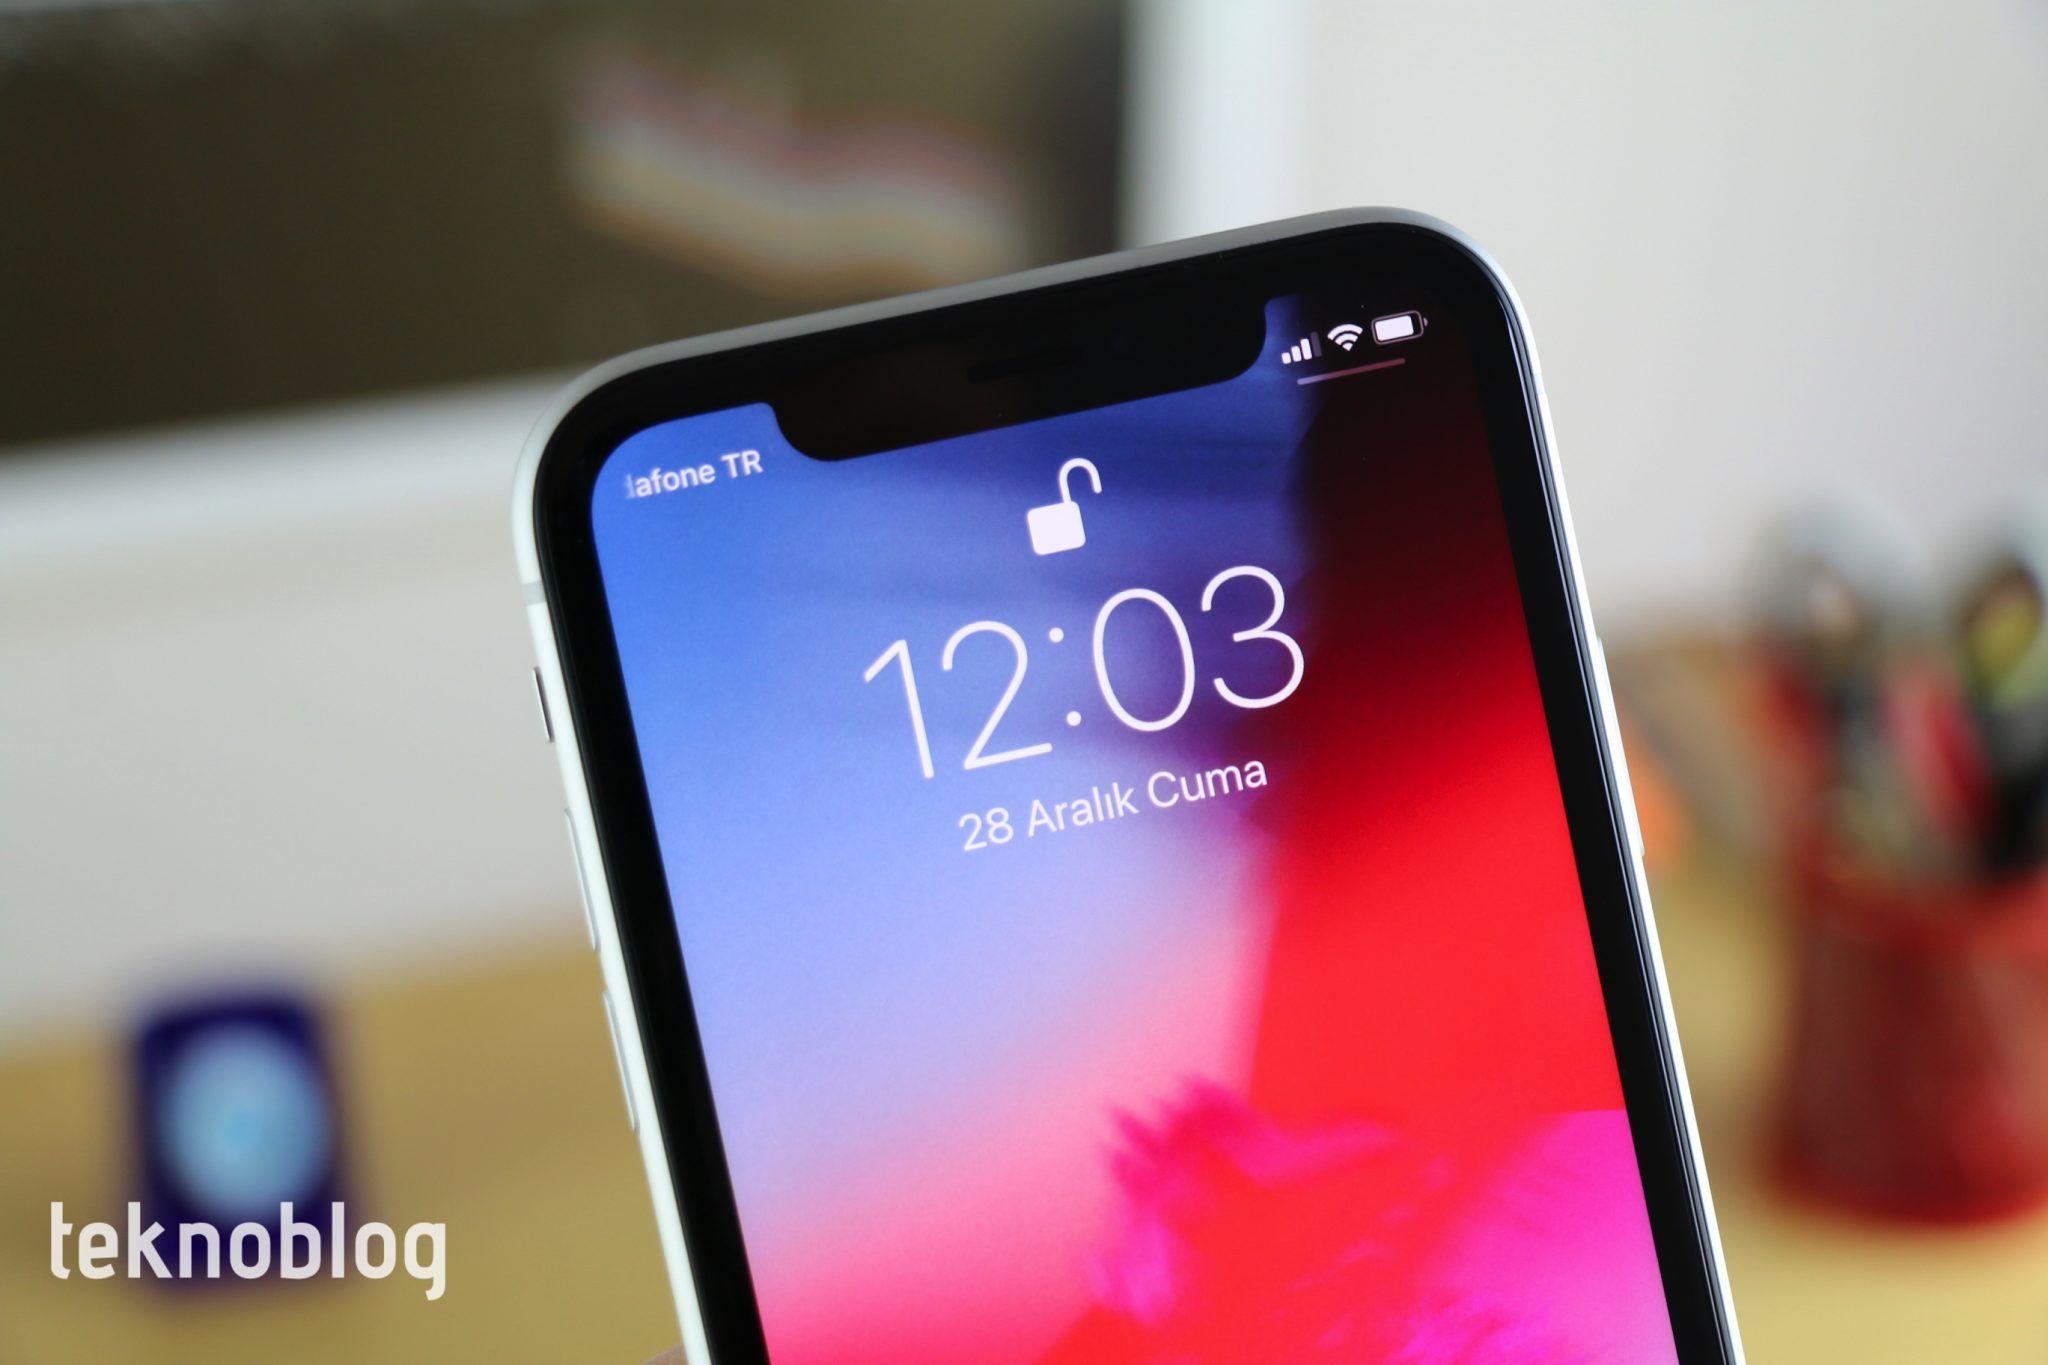 iphone 11r geekbench 4